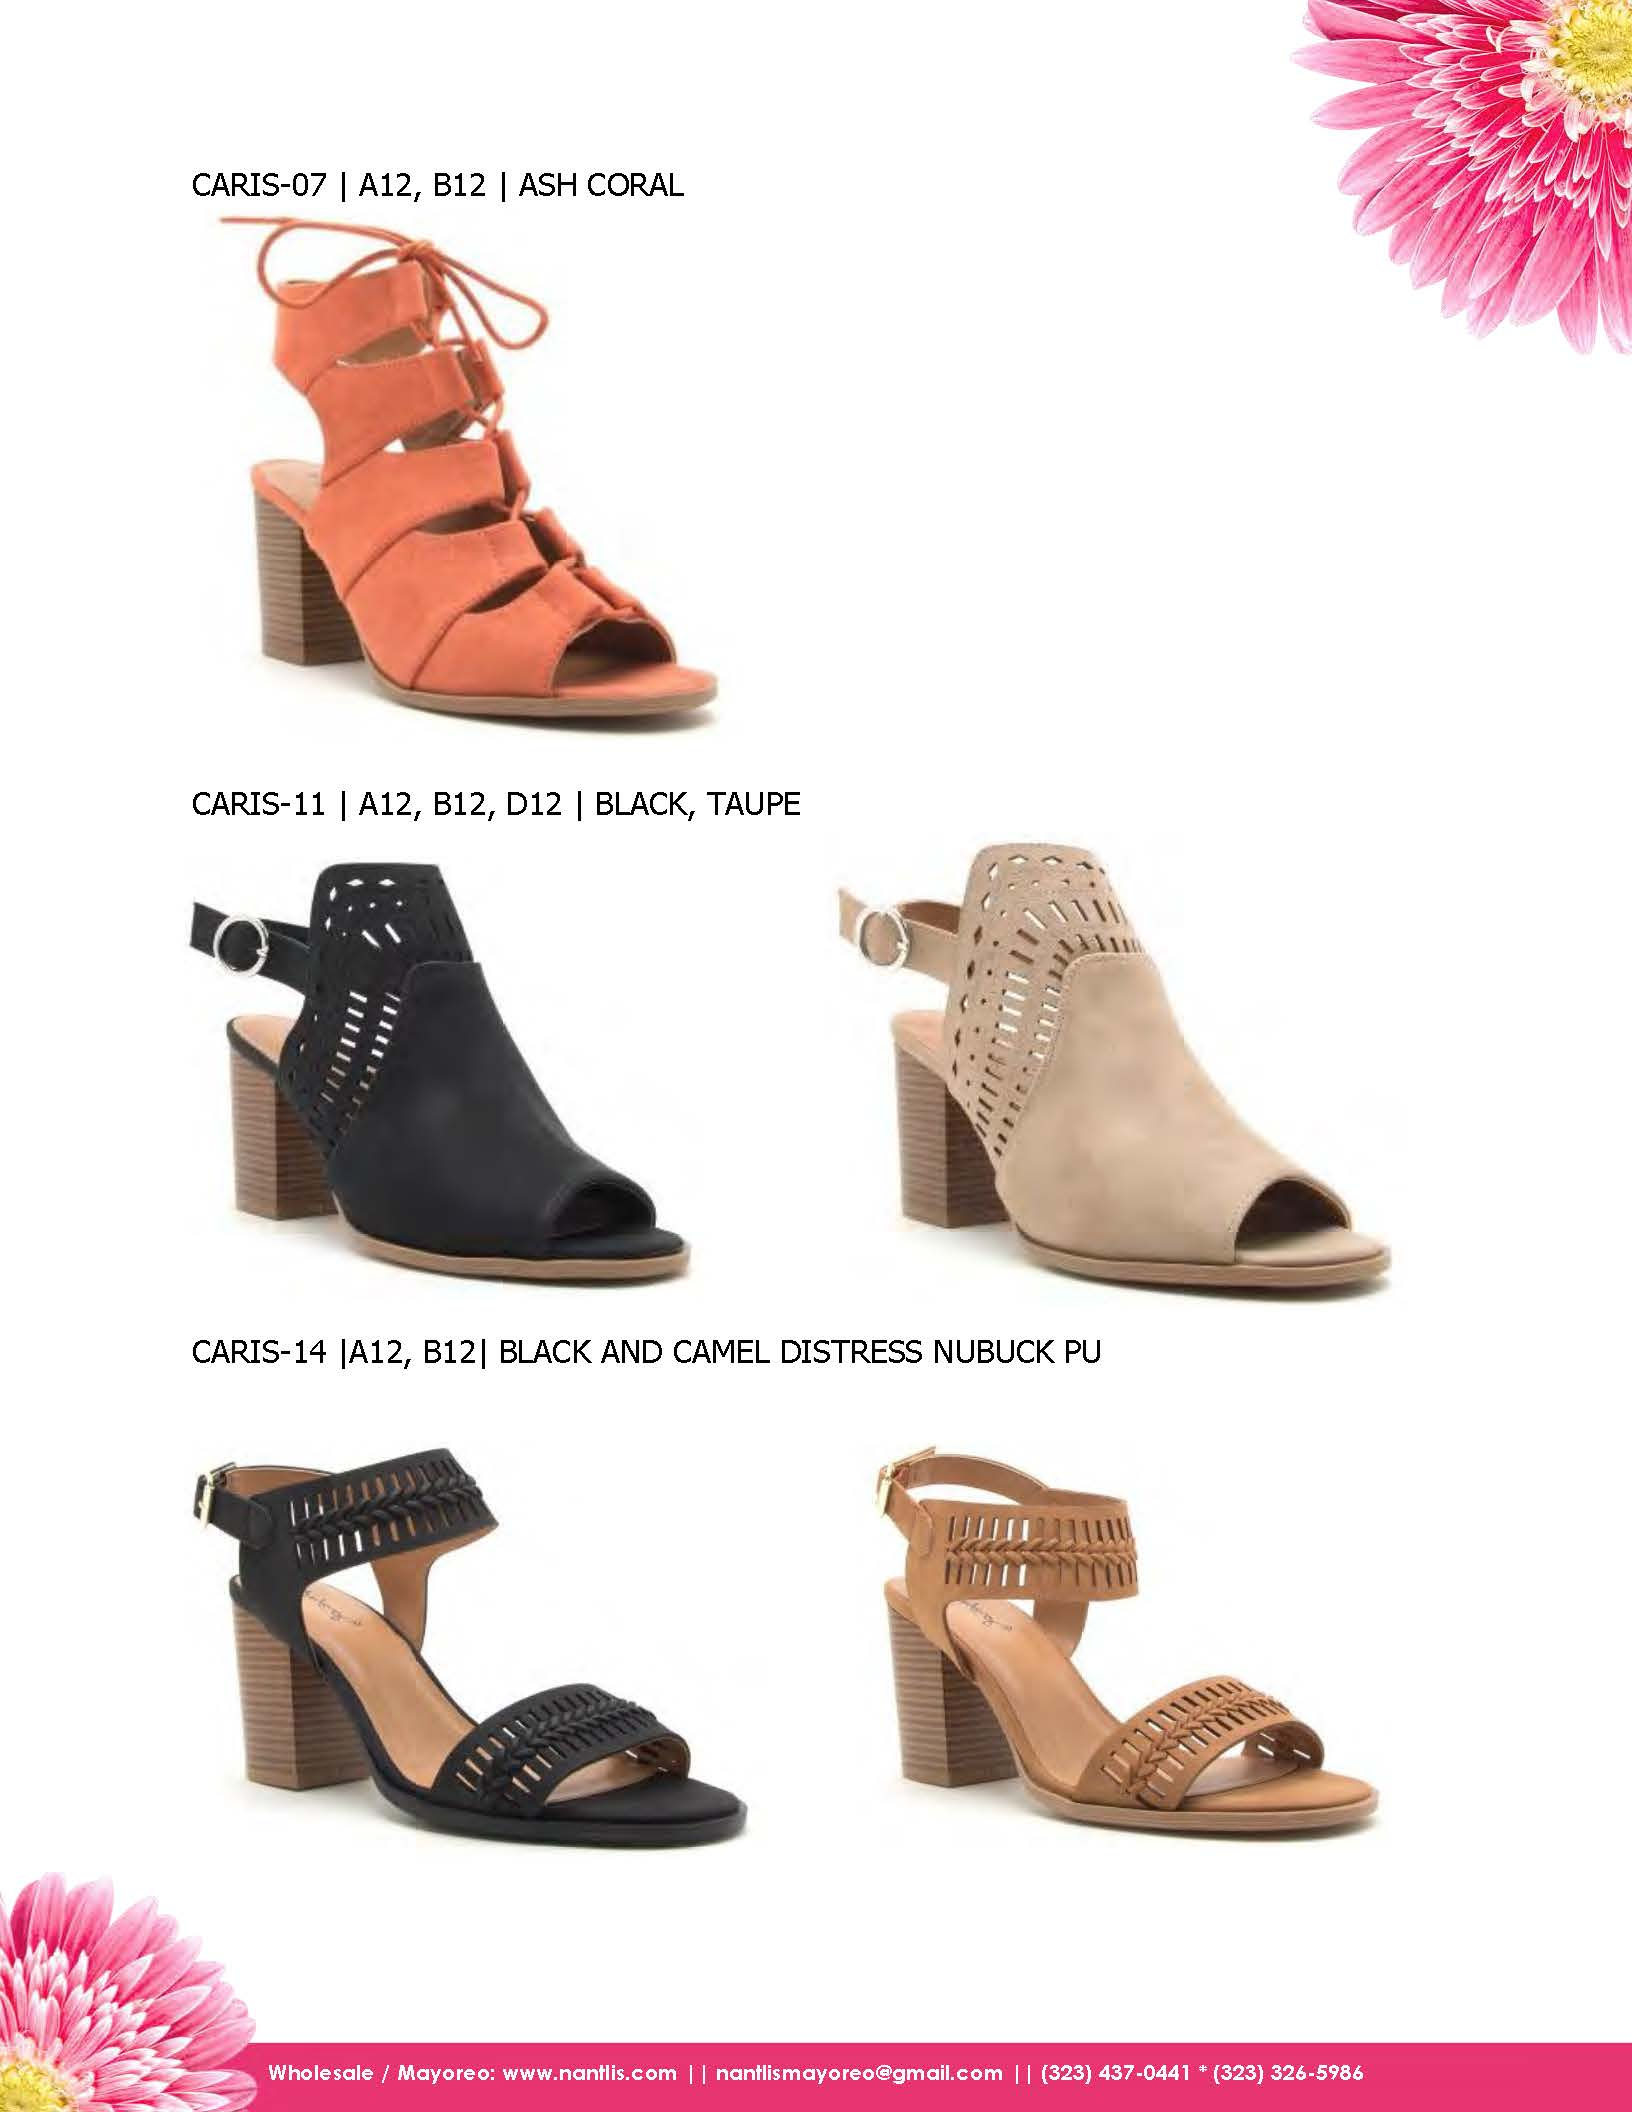 Nantlis Vol QU43 Zapatos para mujer mayoreo Wholesale shoes for women_Page_10